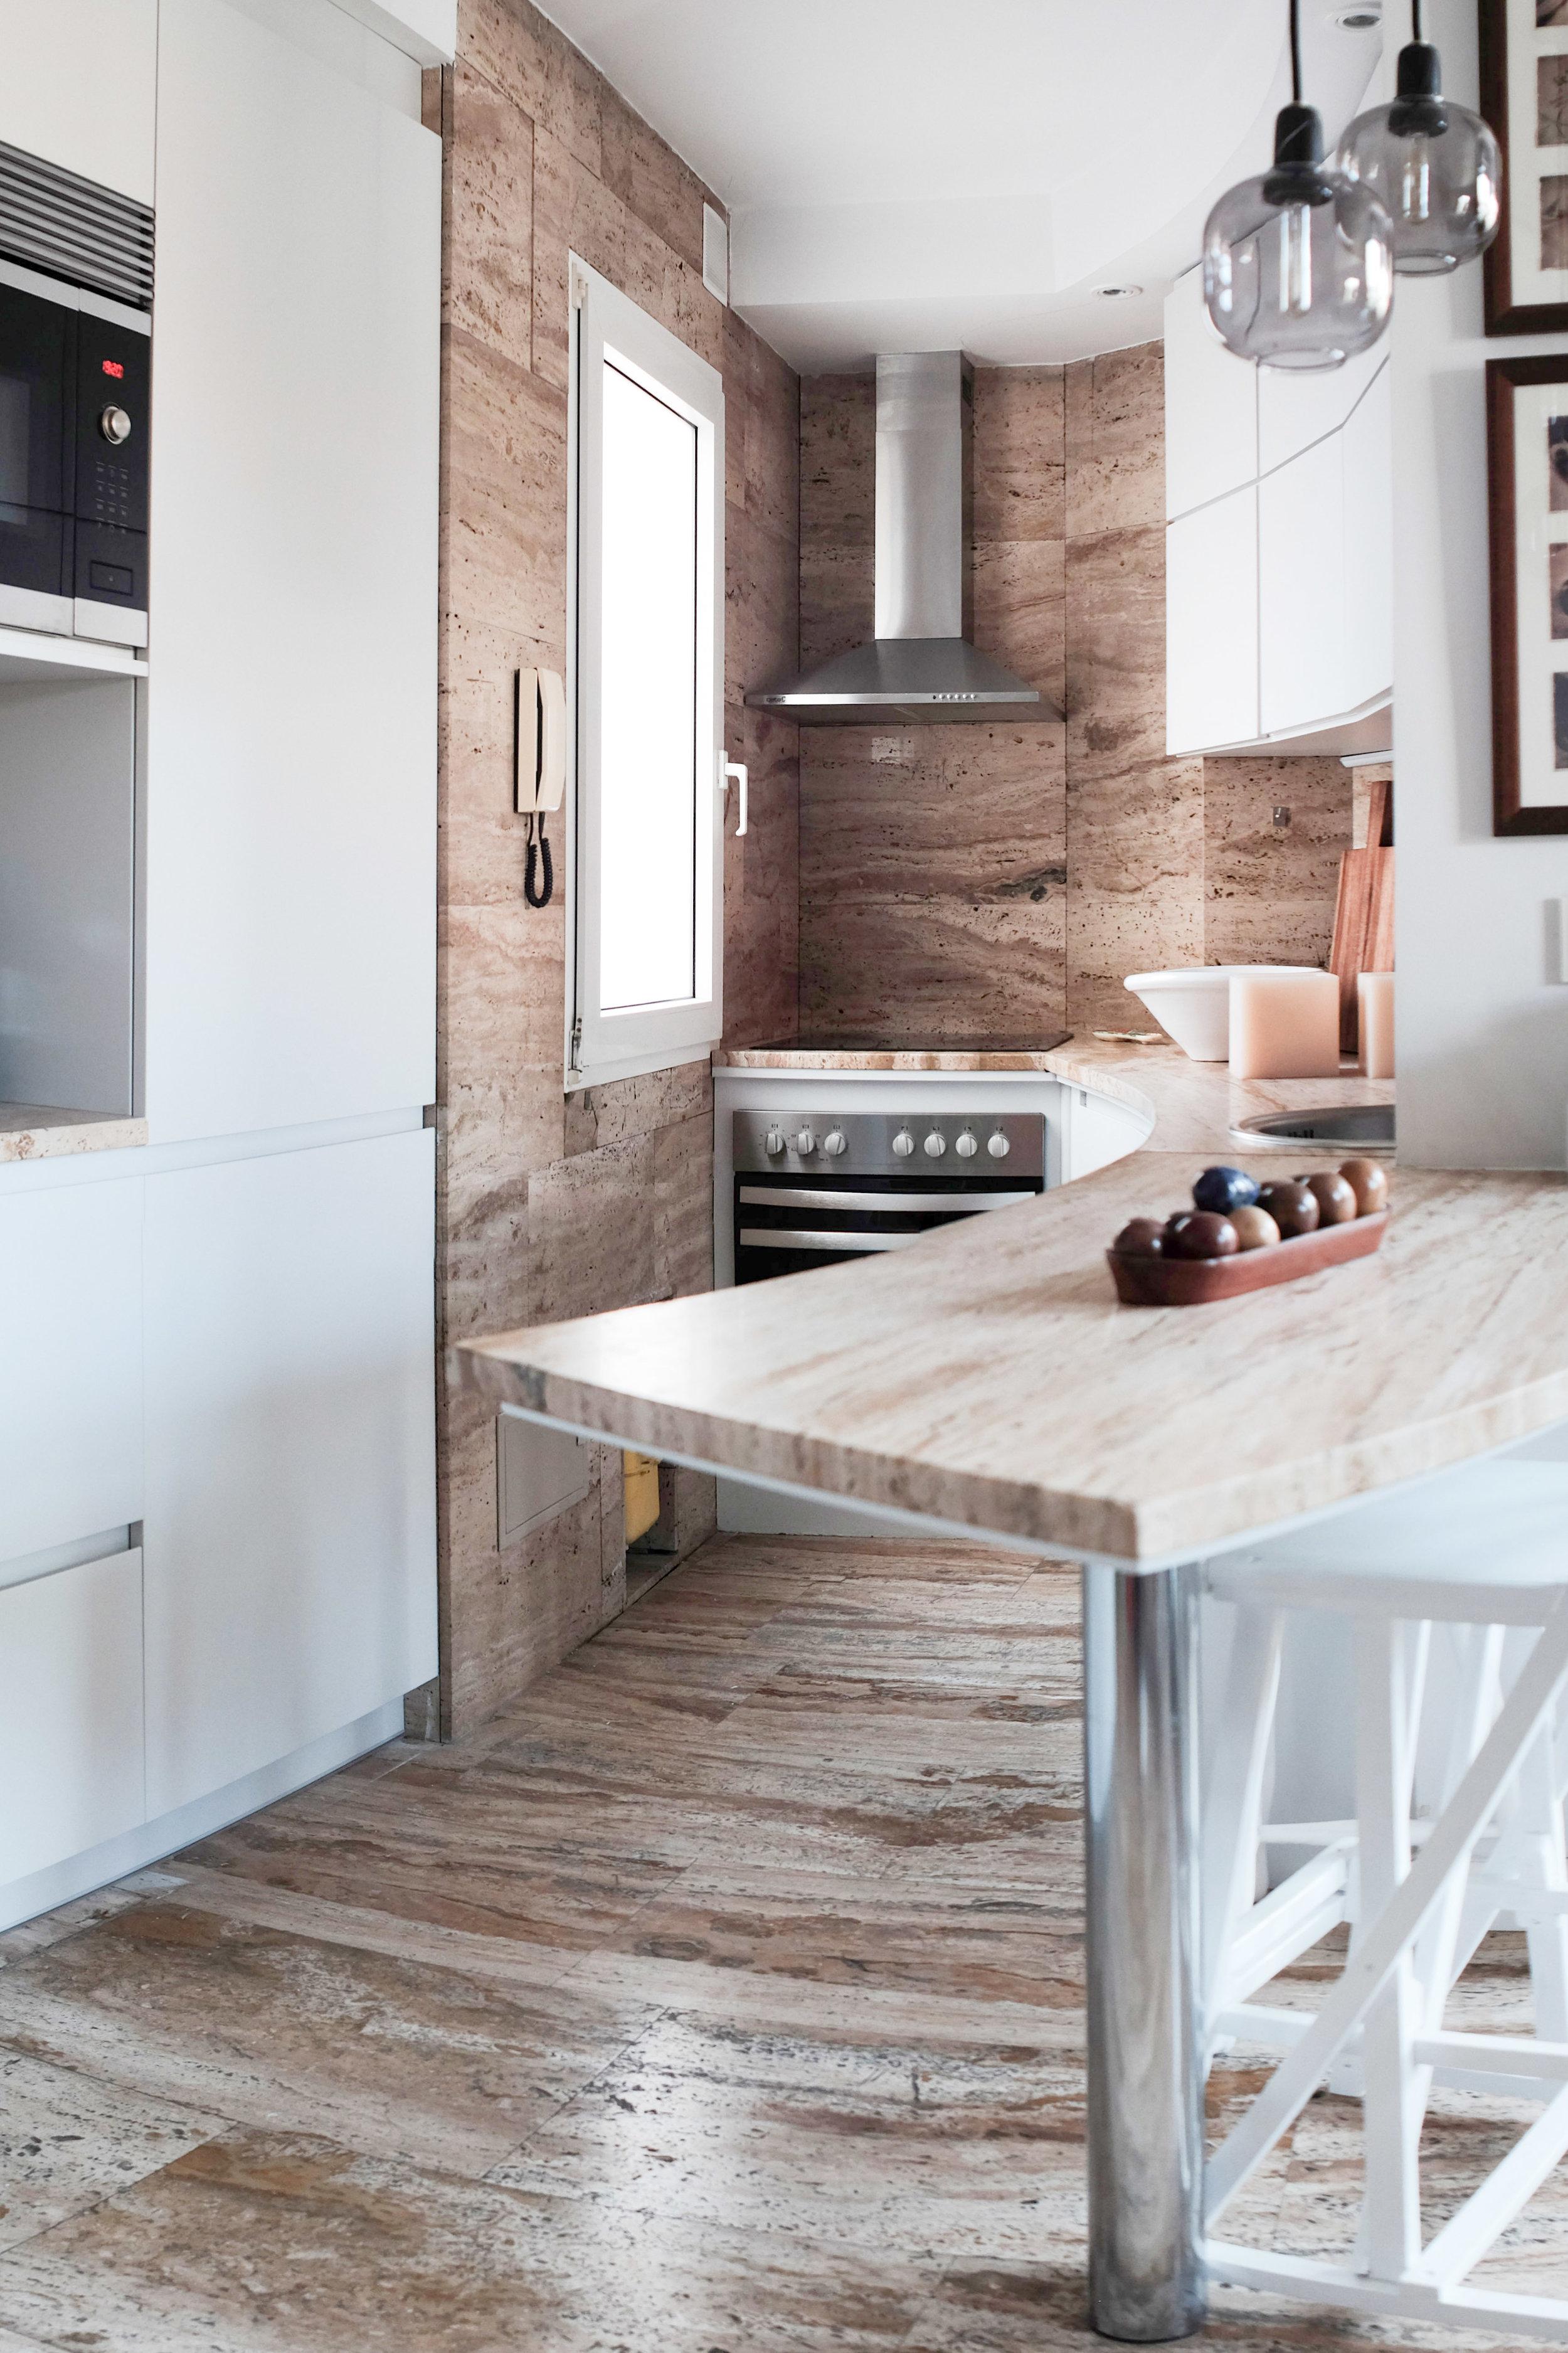 emmme studio reforma cocina curva blanca travertino barra.jpg